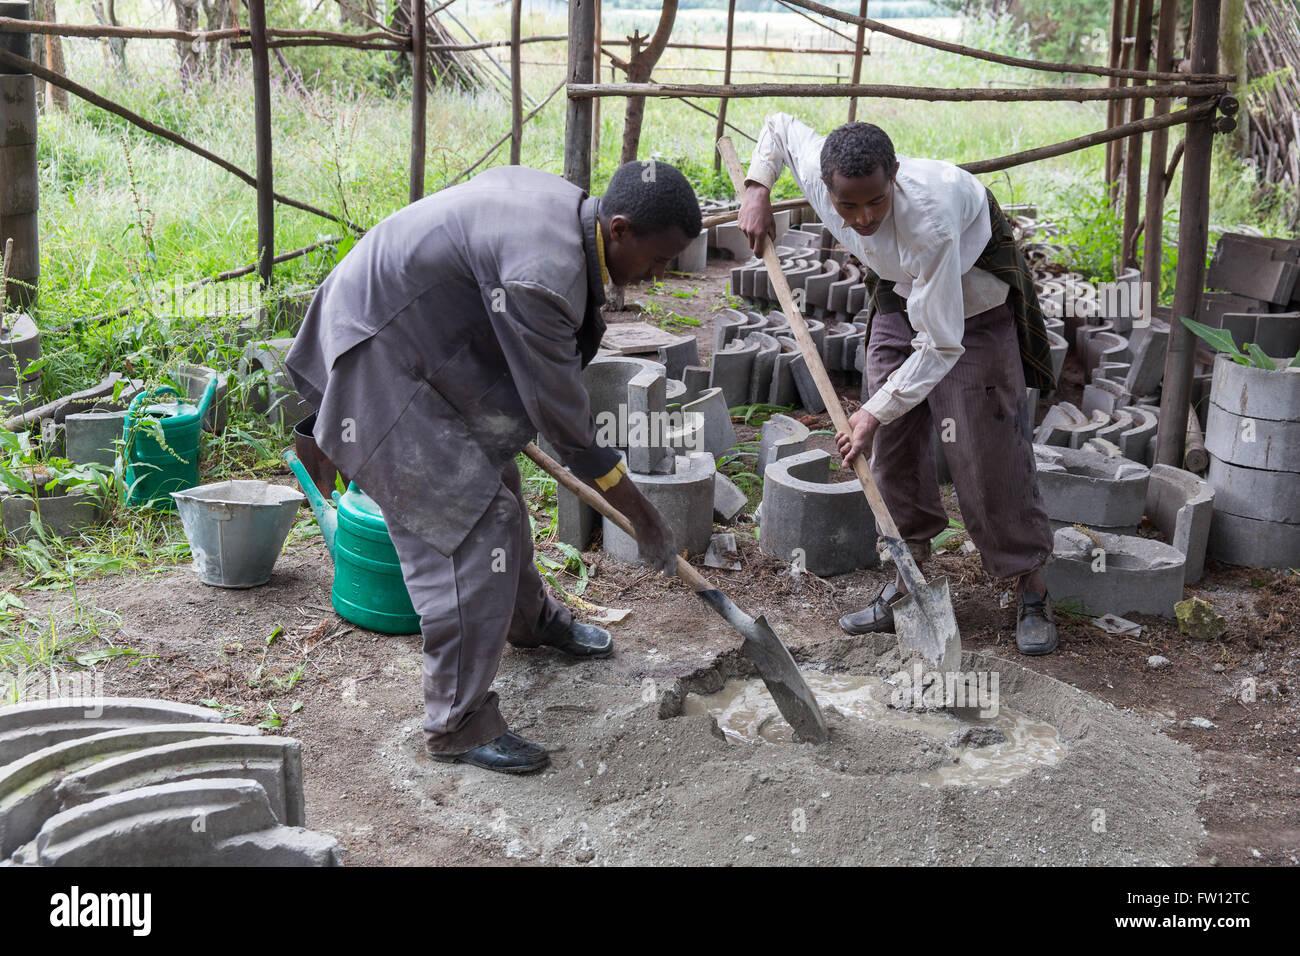 Debre Birhan, Amhara, Ethiopia, October 2013 Two young men making fuel efficient stoves at the EWNHS tree nursery. - Stock Image